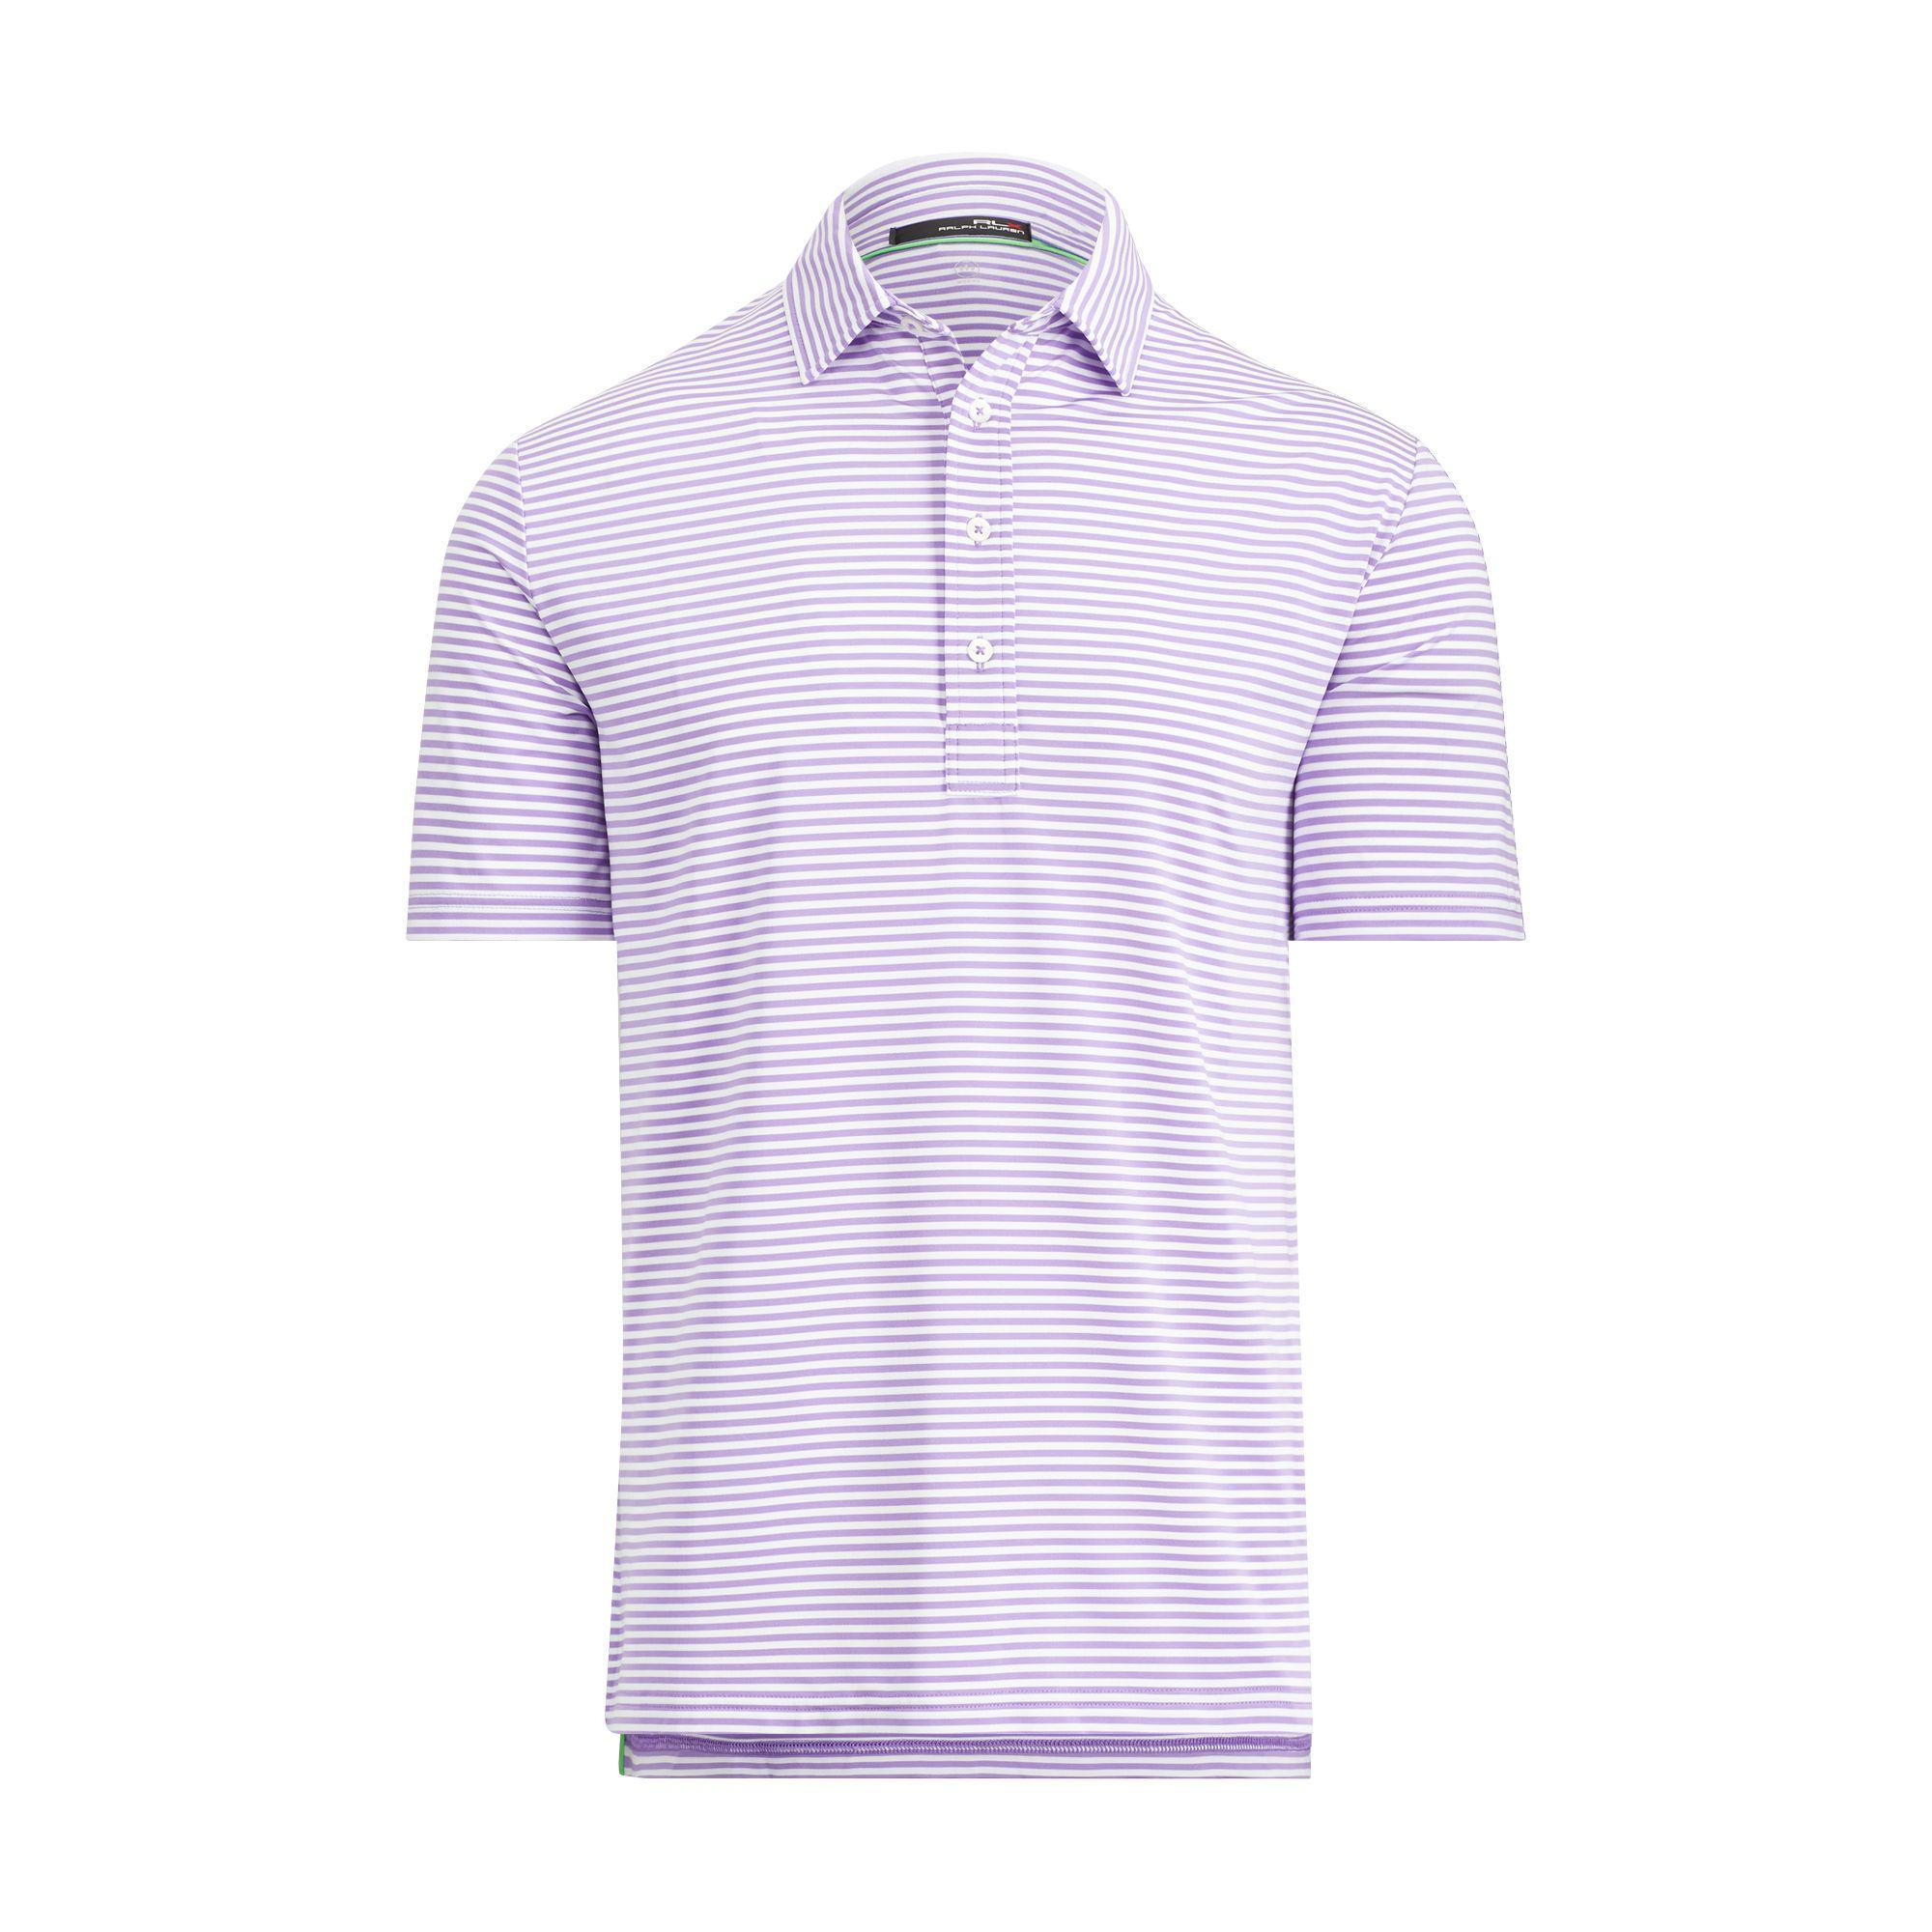 80012e2d987 Lyst - Ralph Lauren Active Fit Performance Polo in Purple for Men